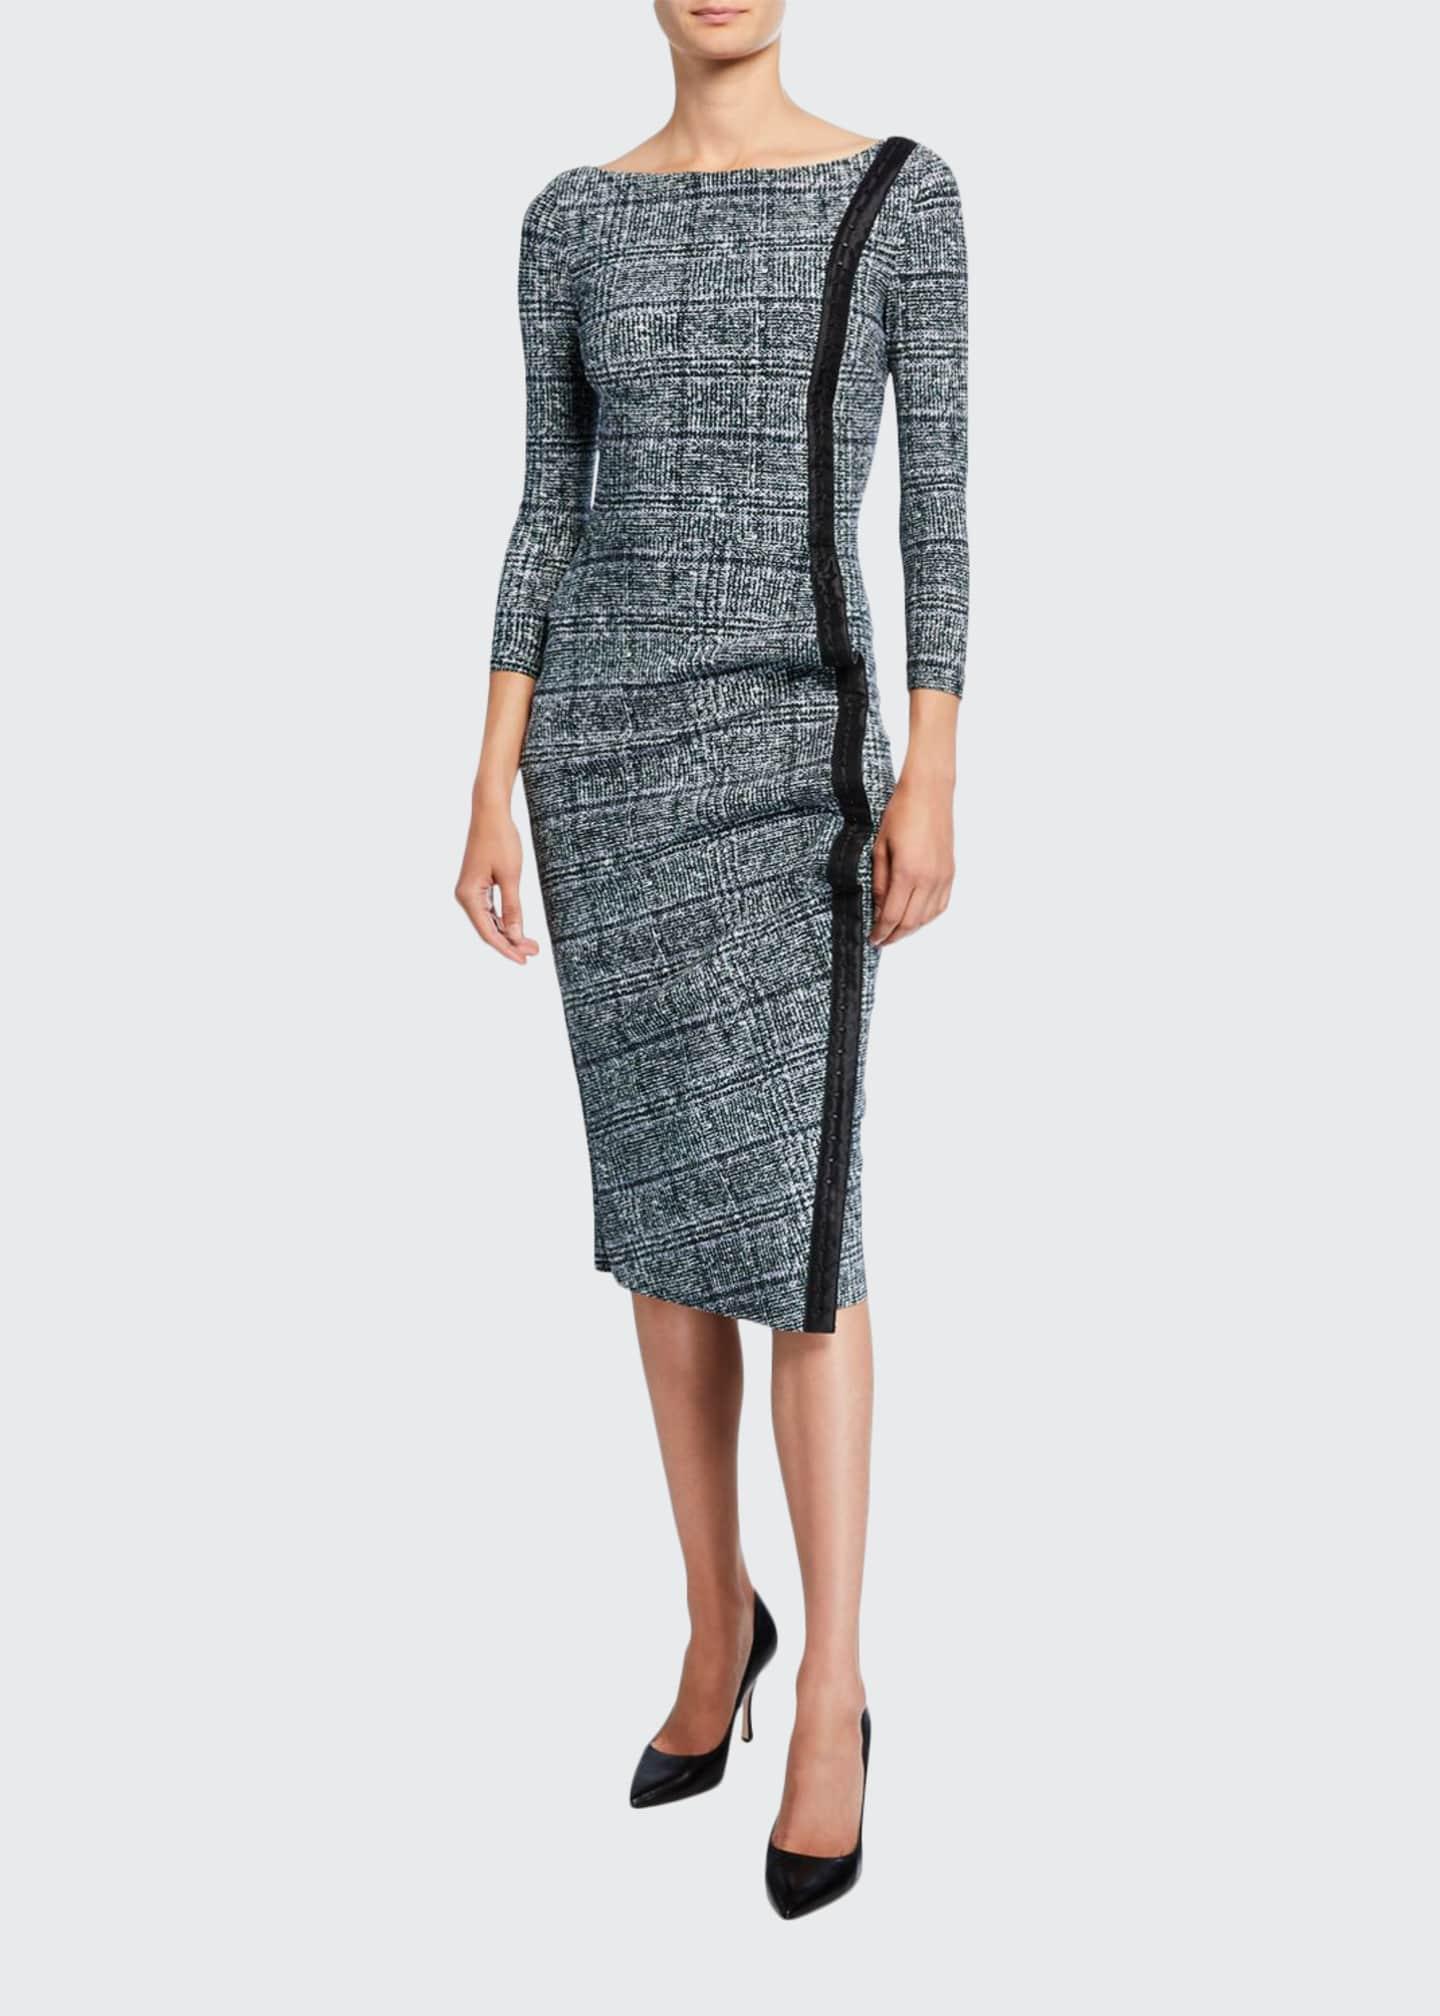 Chiara Boni La Petite Robe Long-Sleeve Tweed Dress